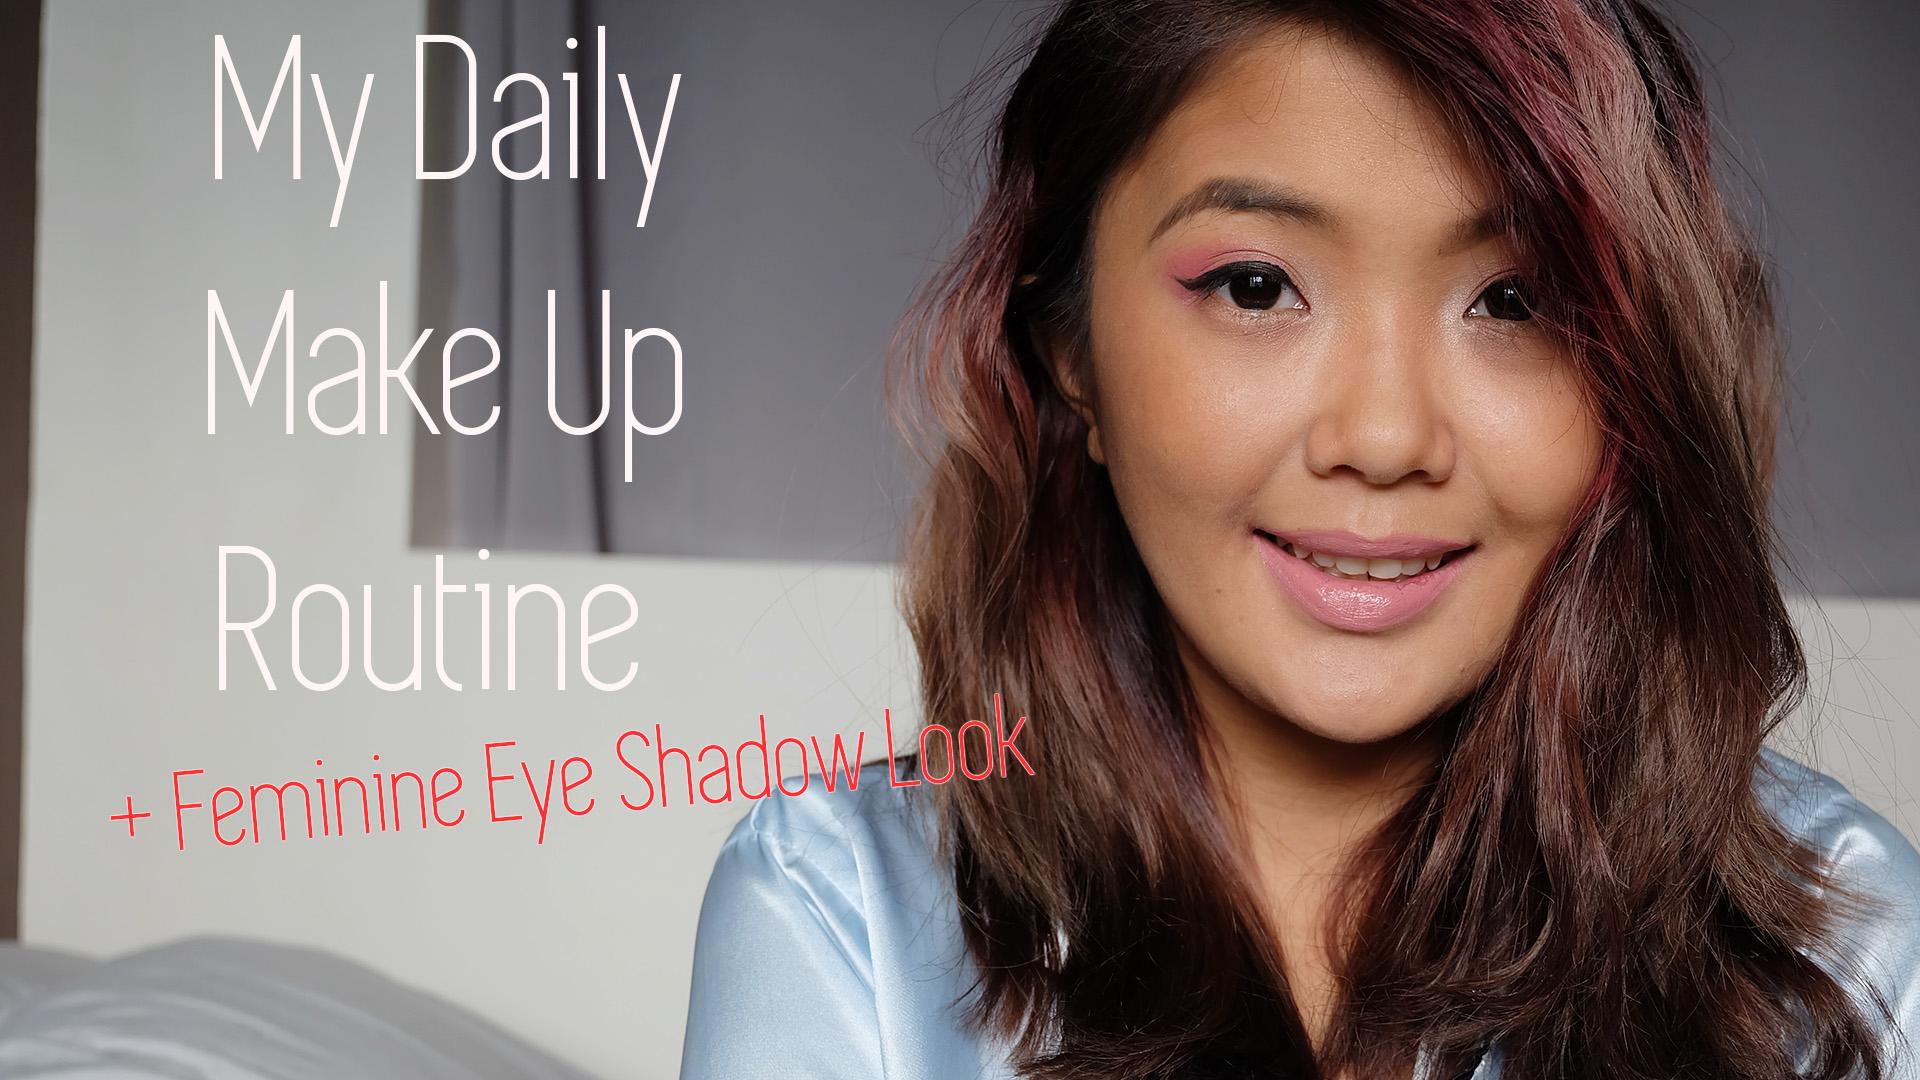 [VLOG] My Daily Make Up Routine + Feminine Eye Shadow Look